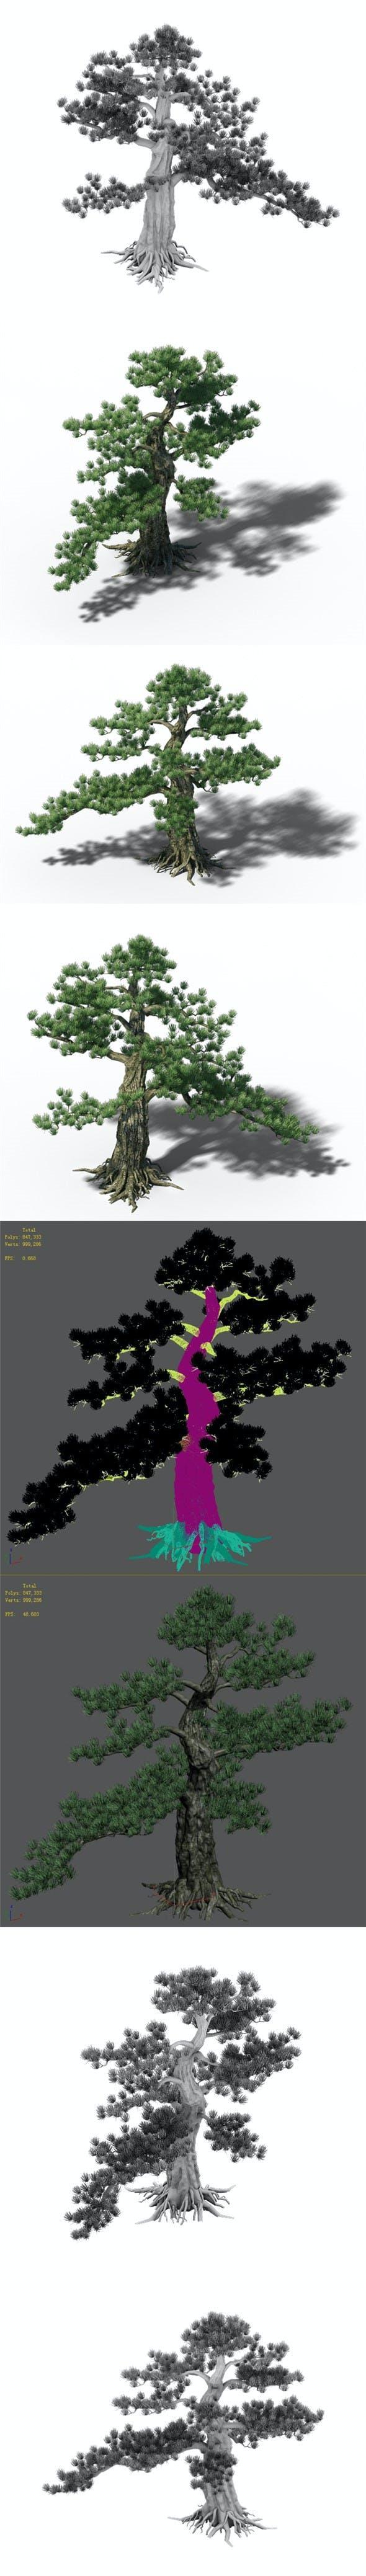 Big Tree - White Chishan - Pine 02 - 3DOcean Item for Sale